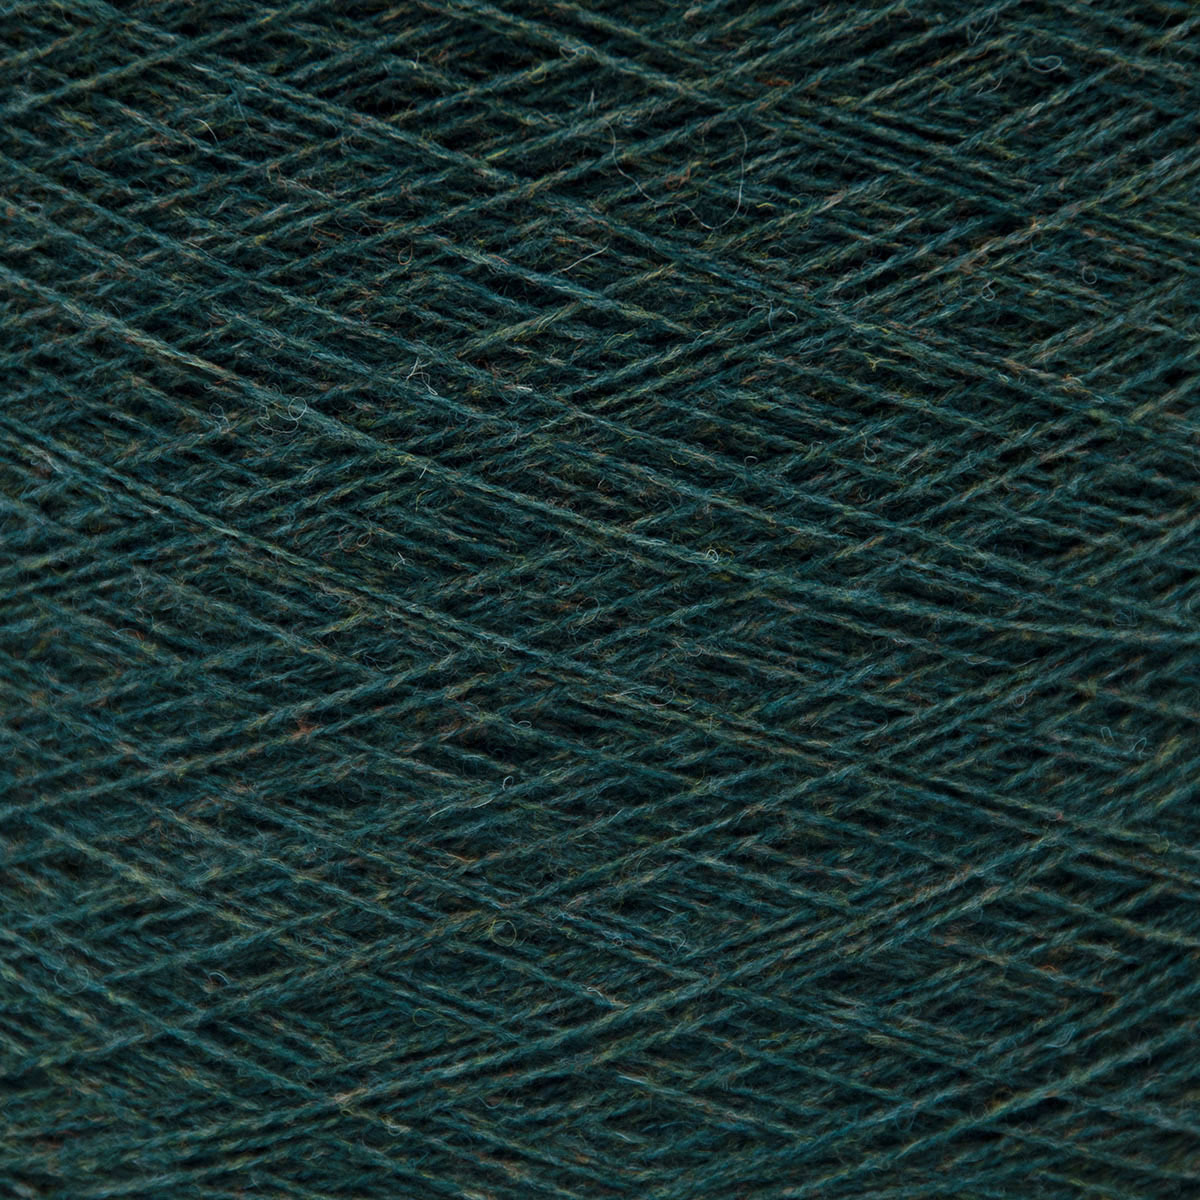 Knoll Yarns Merino Lambswool (тонкий) - 392